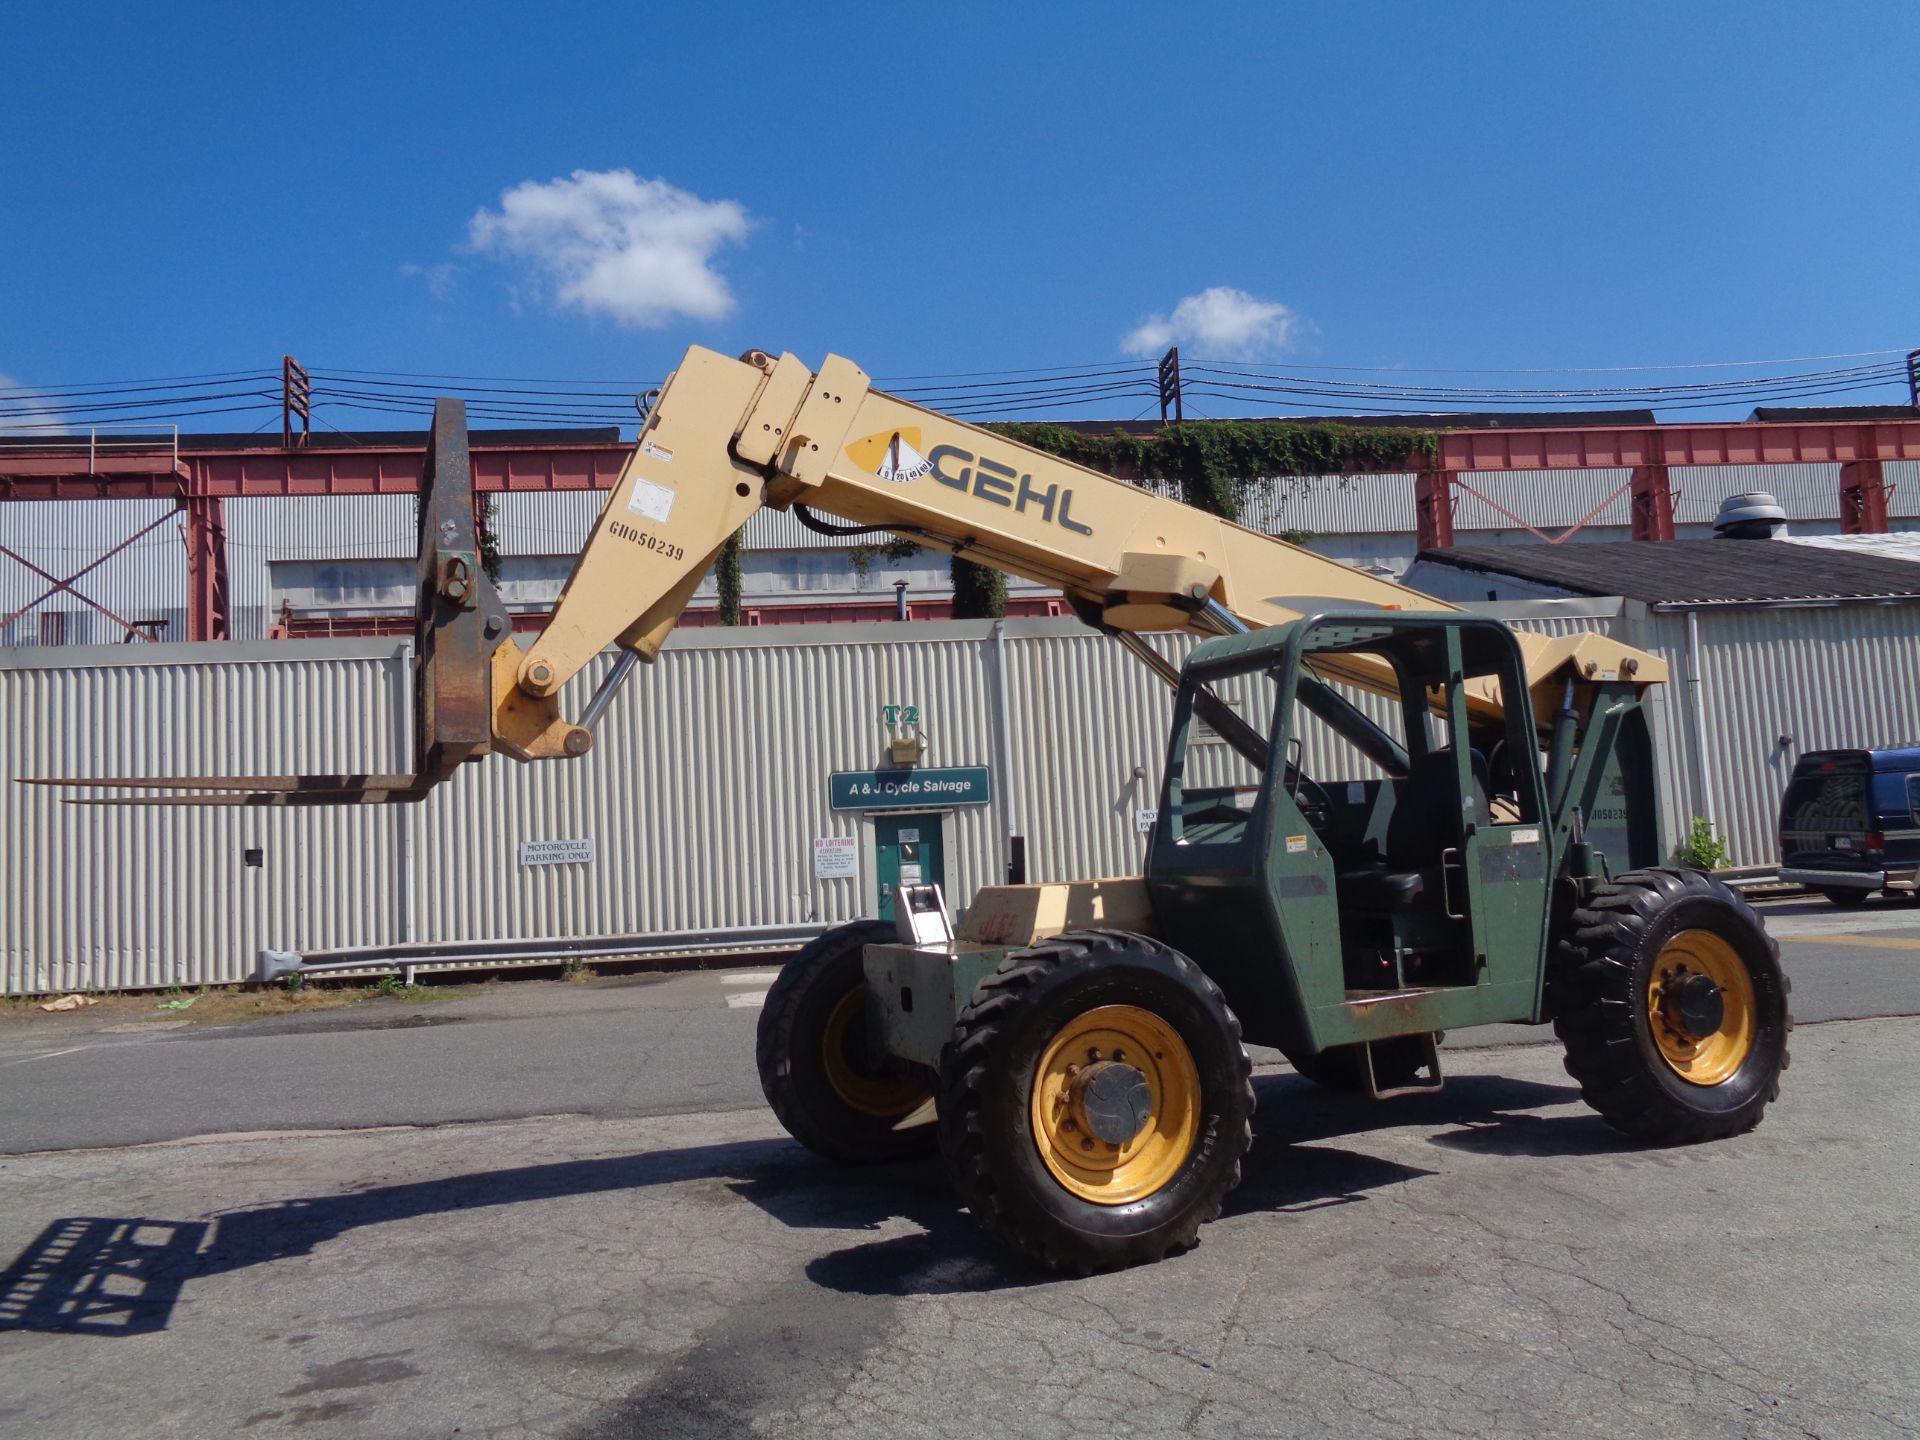 Lot 46 - Gehl RS8-42 8,000lb Telecopic Forklift